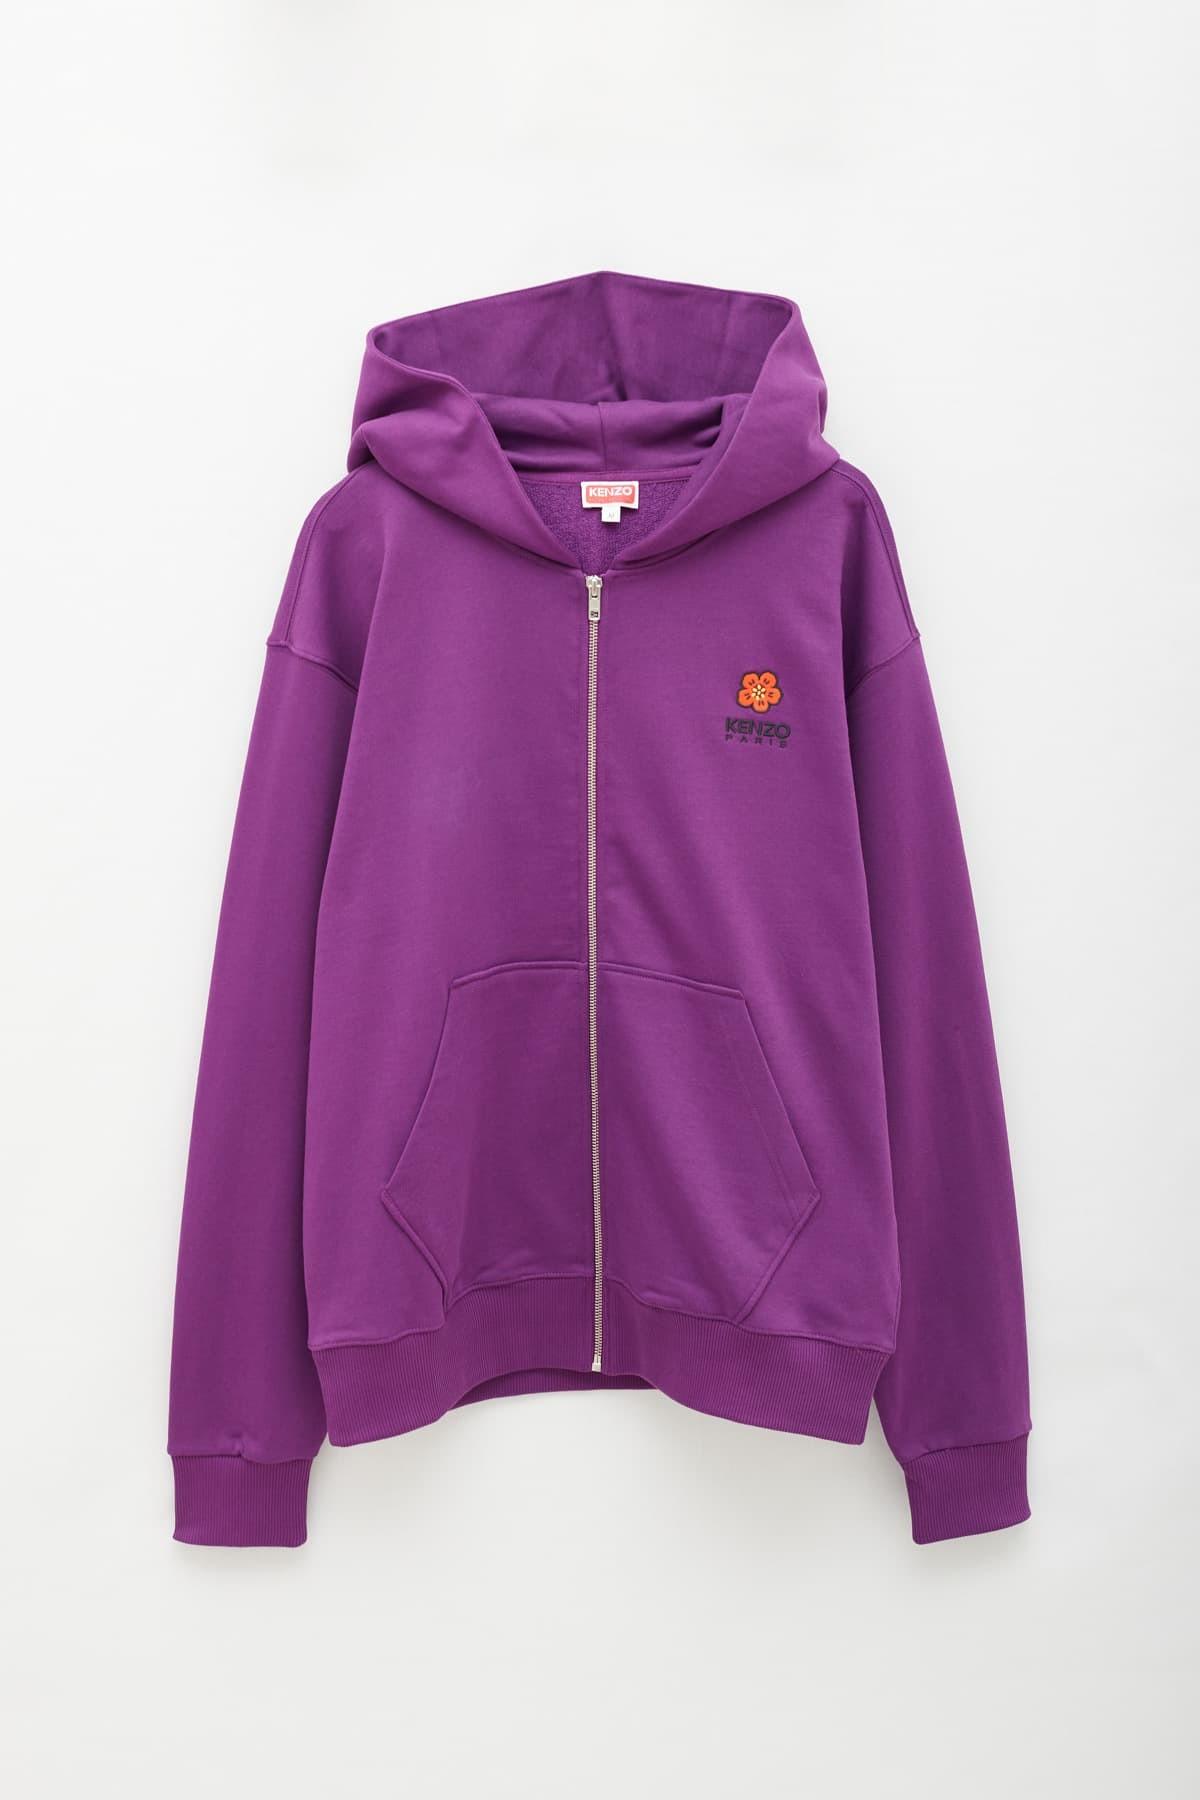 Shop Marni Navy Basic Logo Sweatshirt FUMU0074P0